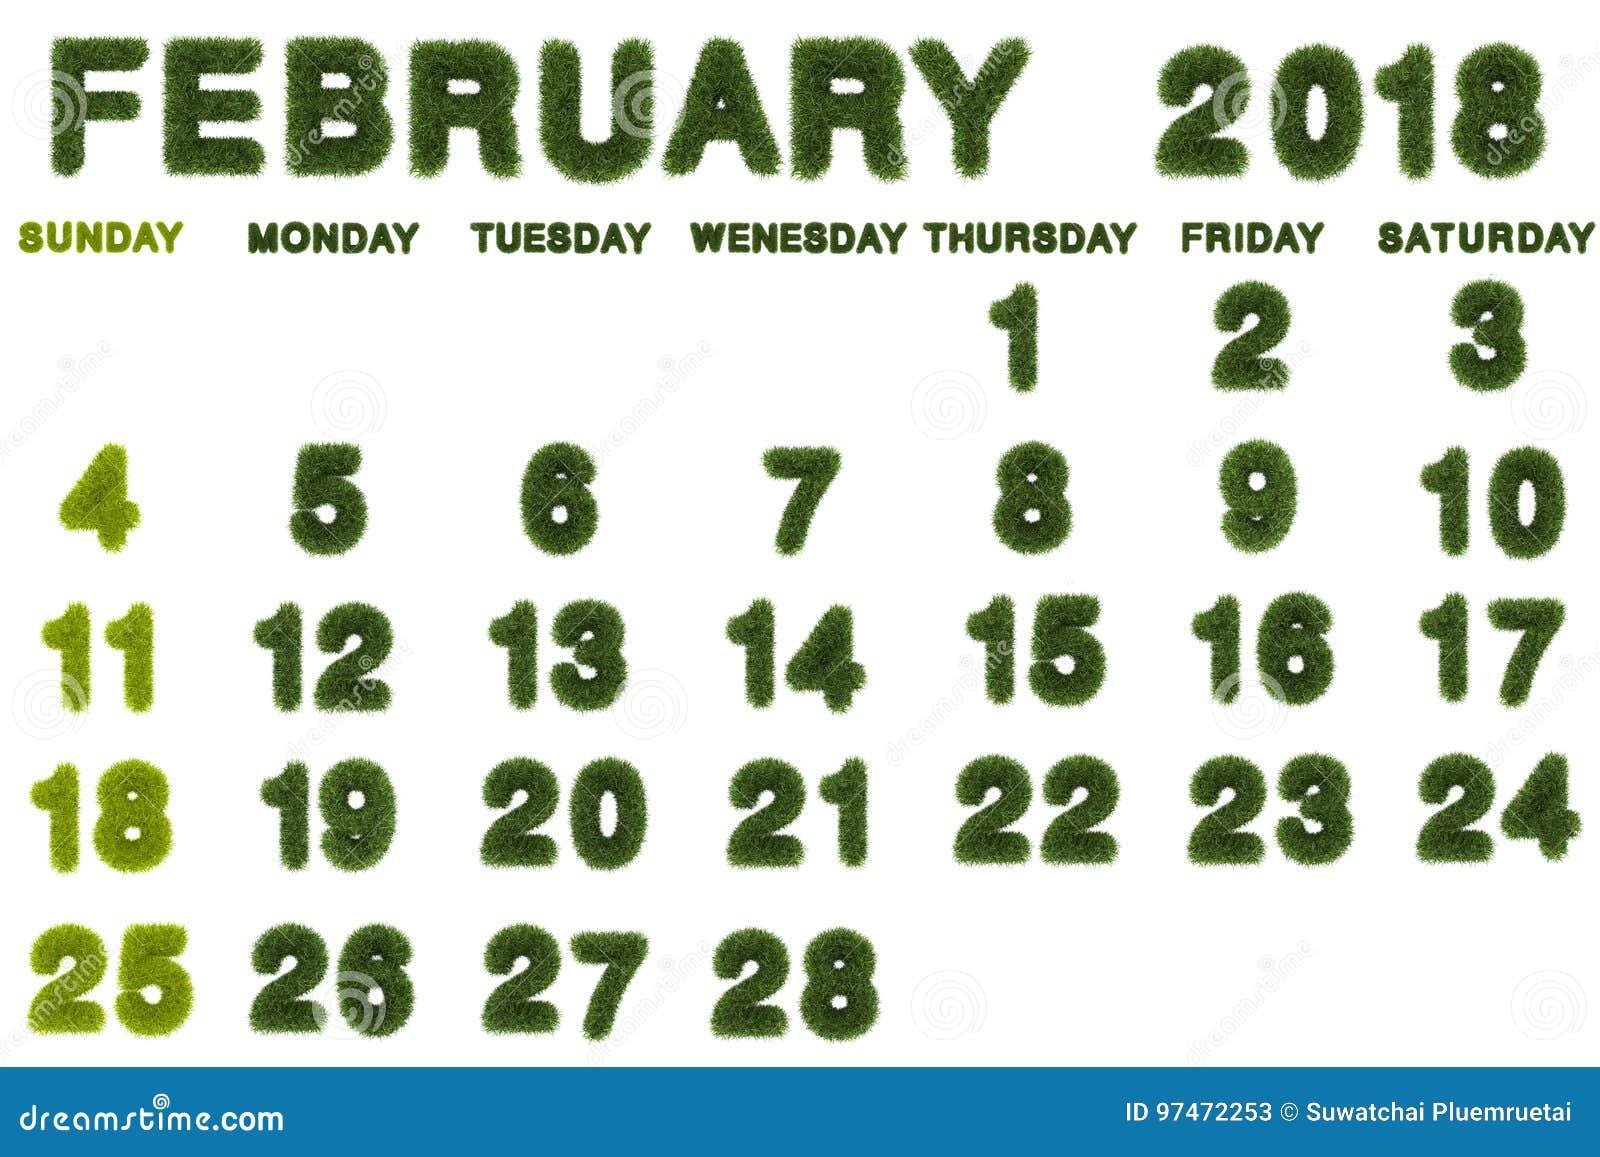 calendar background february 2018 - Toreto.co